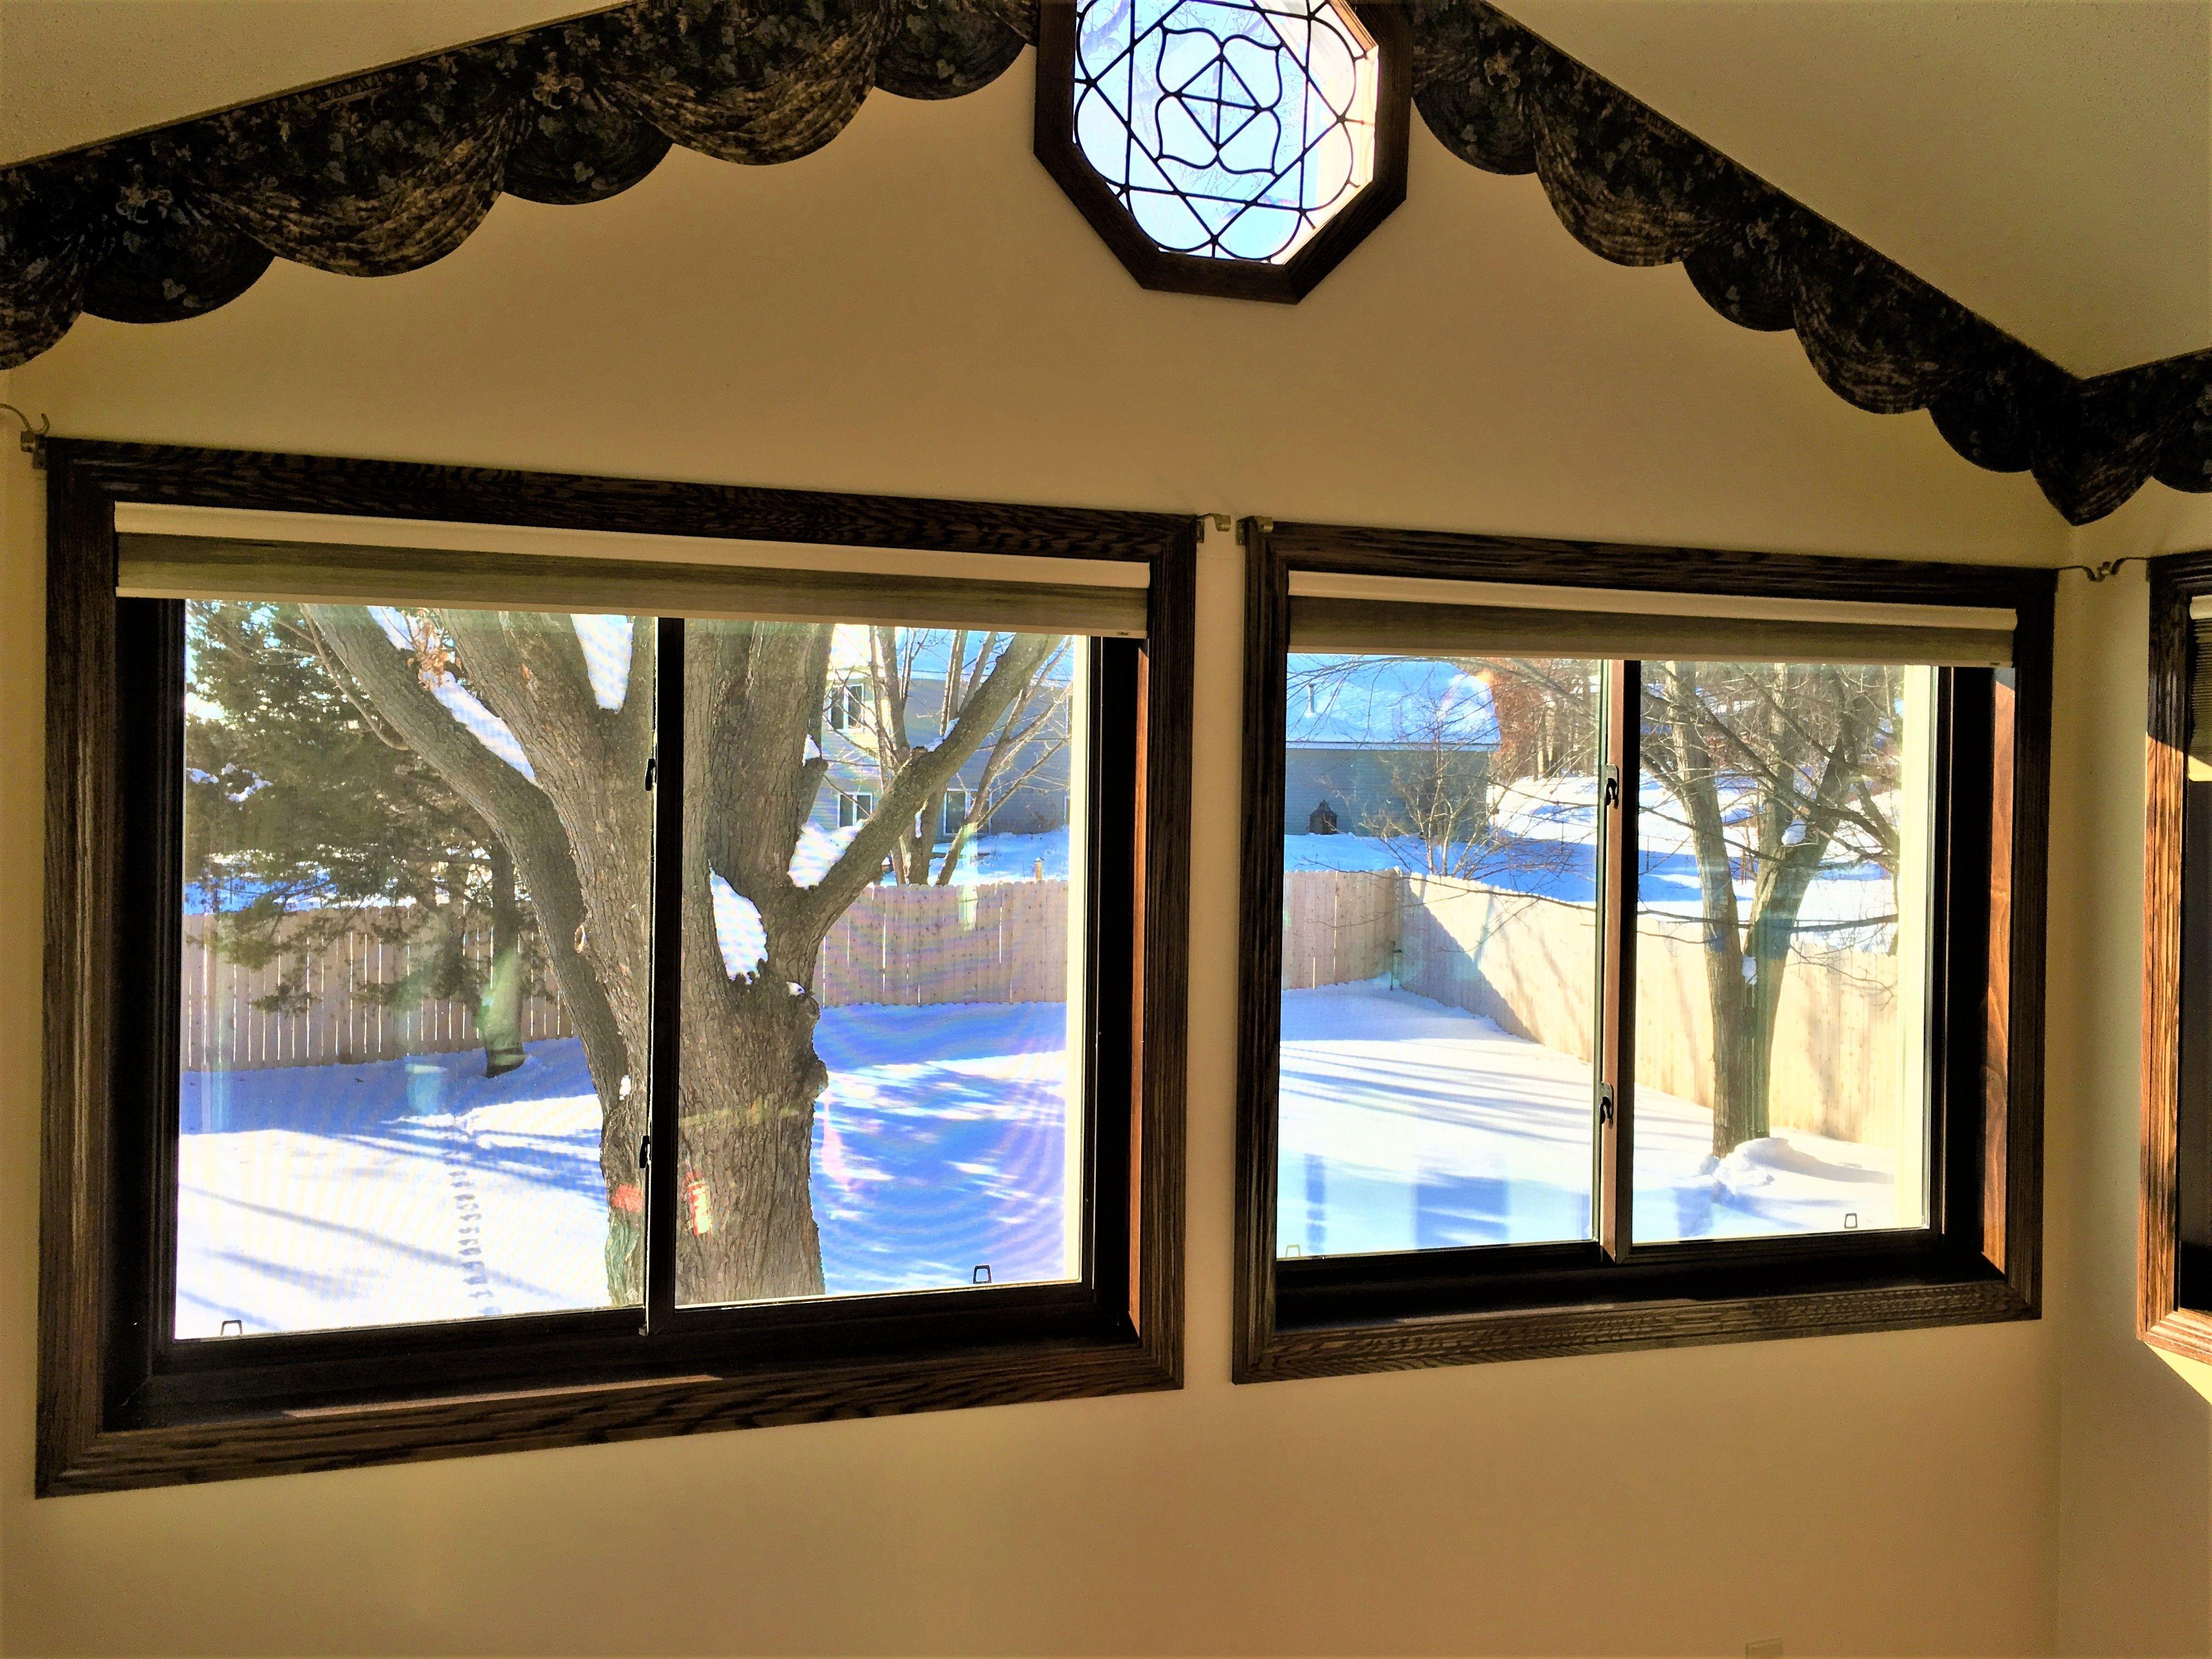 Colette S Seasonguard Sliding Window Project Windows Sliding Windows Window Projects